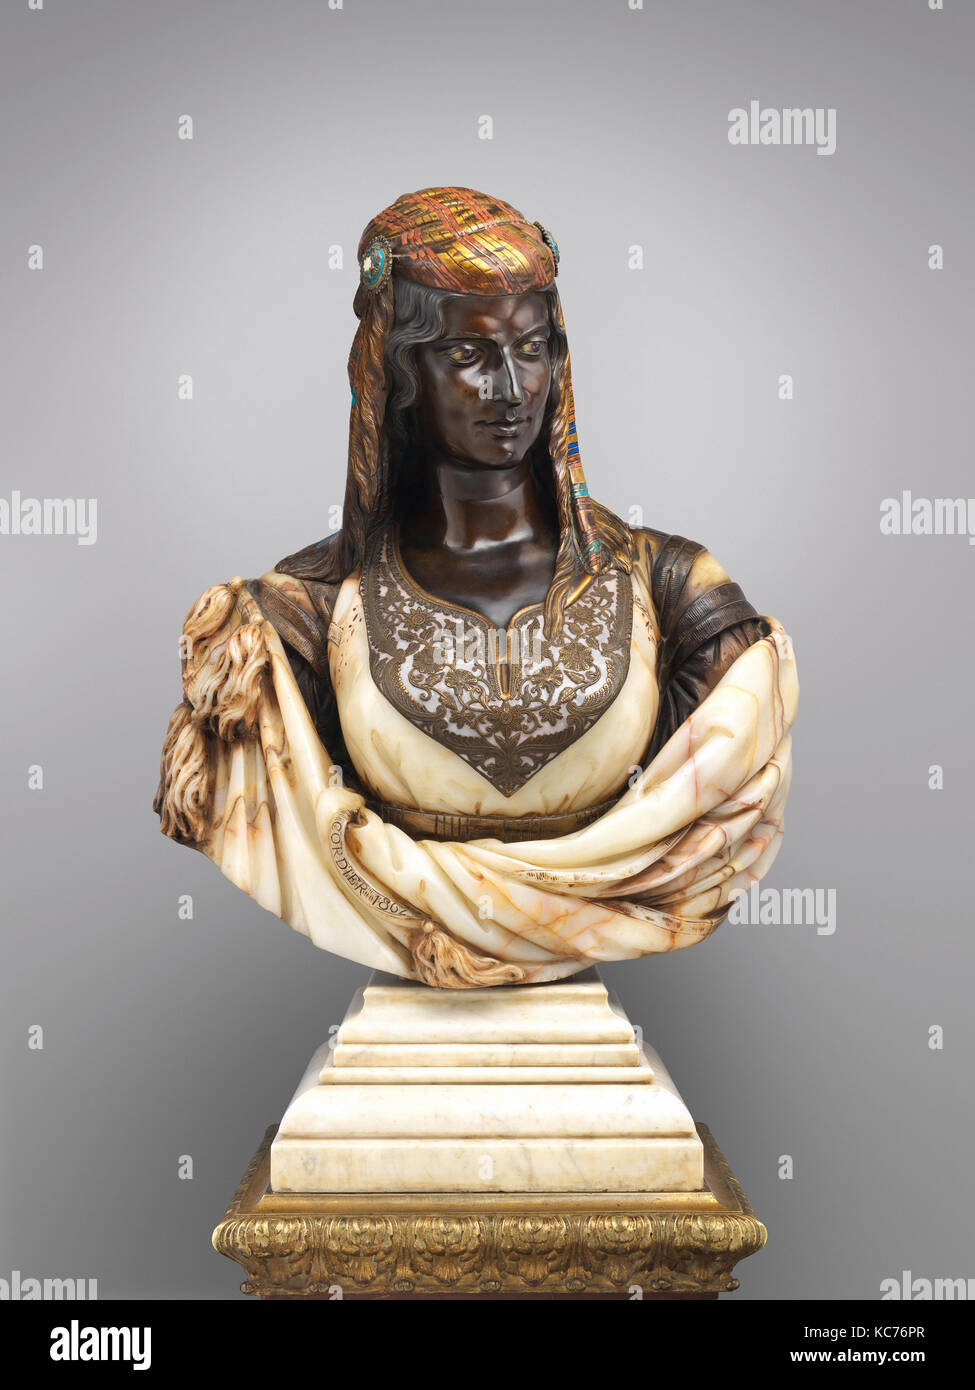 The Jewish Woman of Algiers, Charles-Henri-Joseph Cordier, 1862 - Stock Image